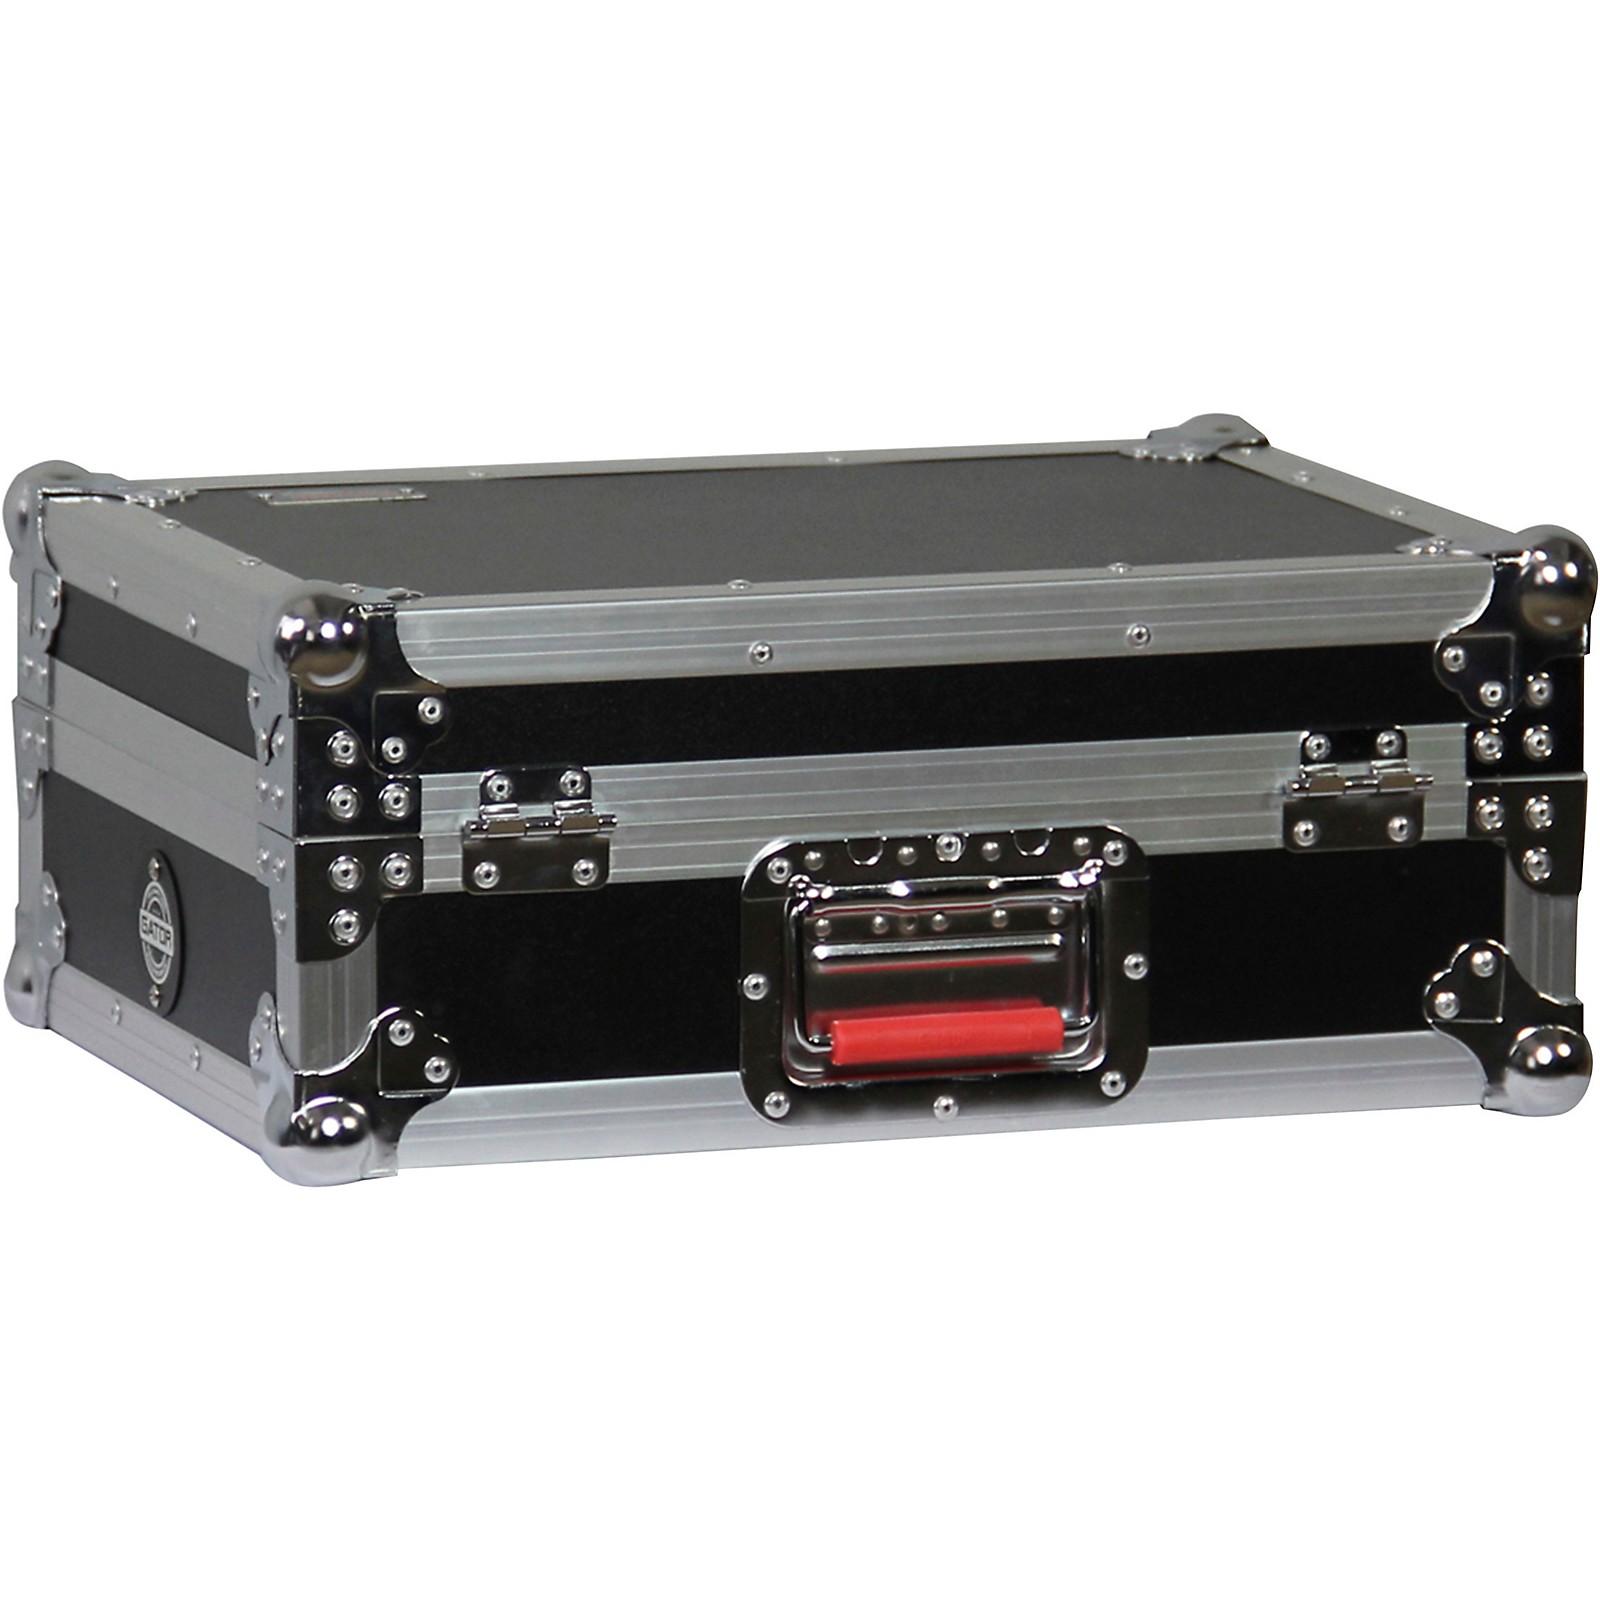 Gator G-Tour DJ CD 2000 ATA Road Flight Case for Large-Format Media Players, CDJ-2000NXS2